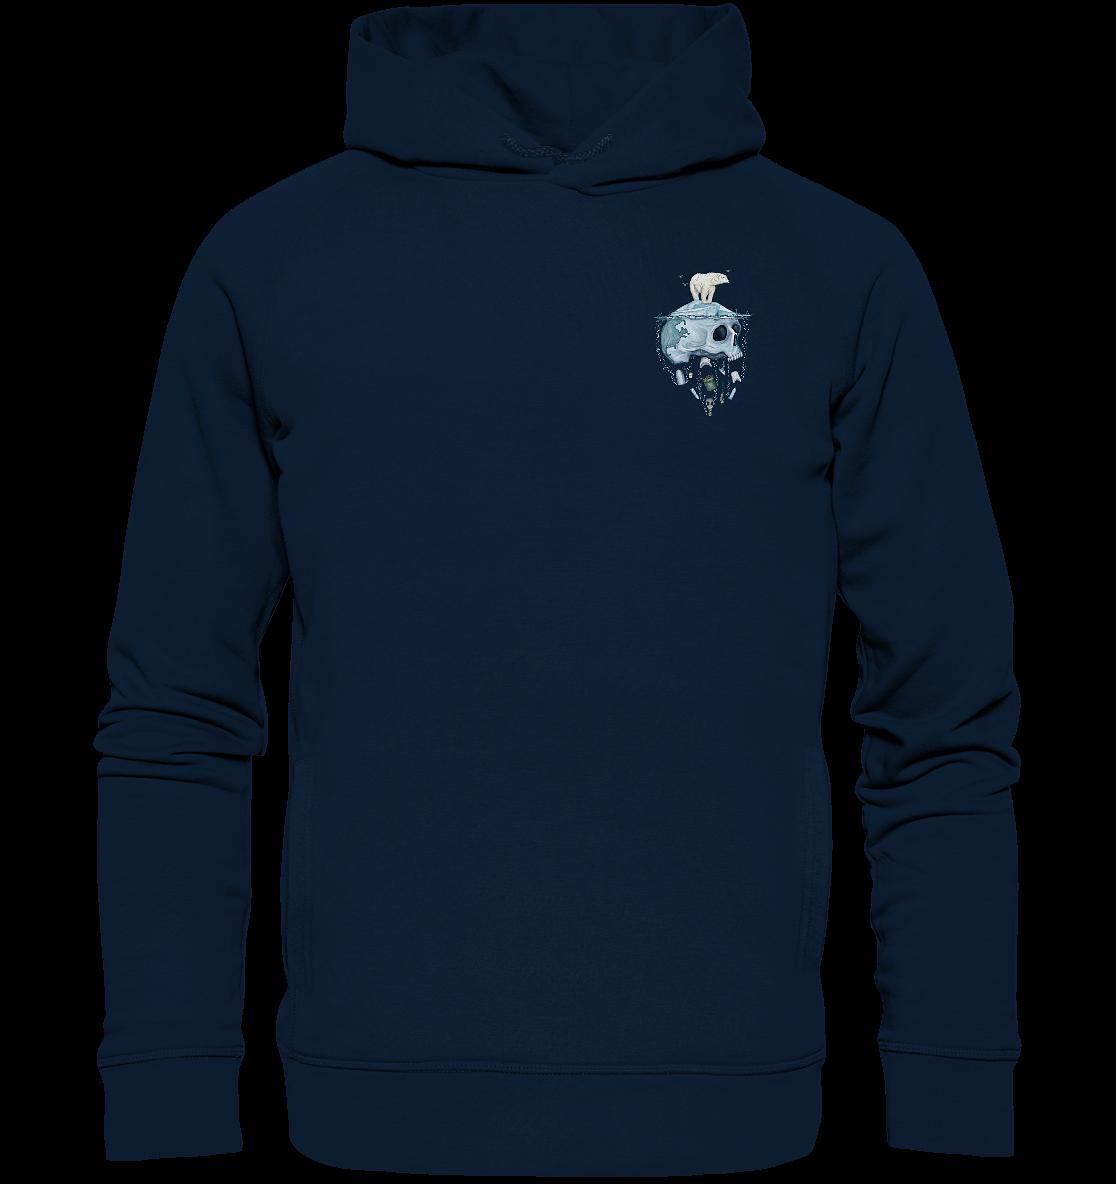 front-organic-fashion-hoodie-0e2035-1116x.png